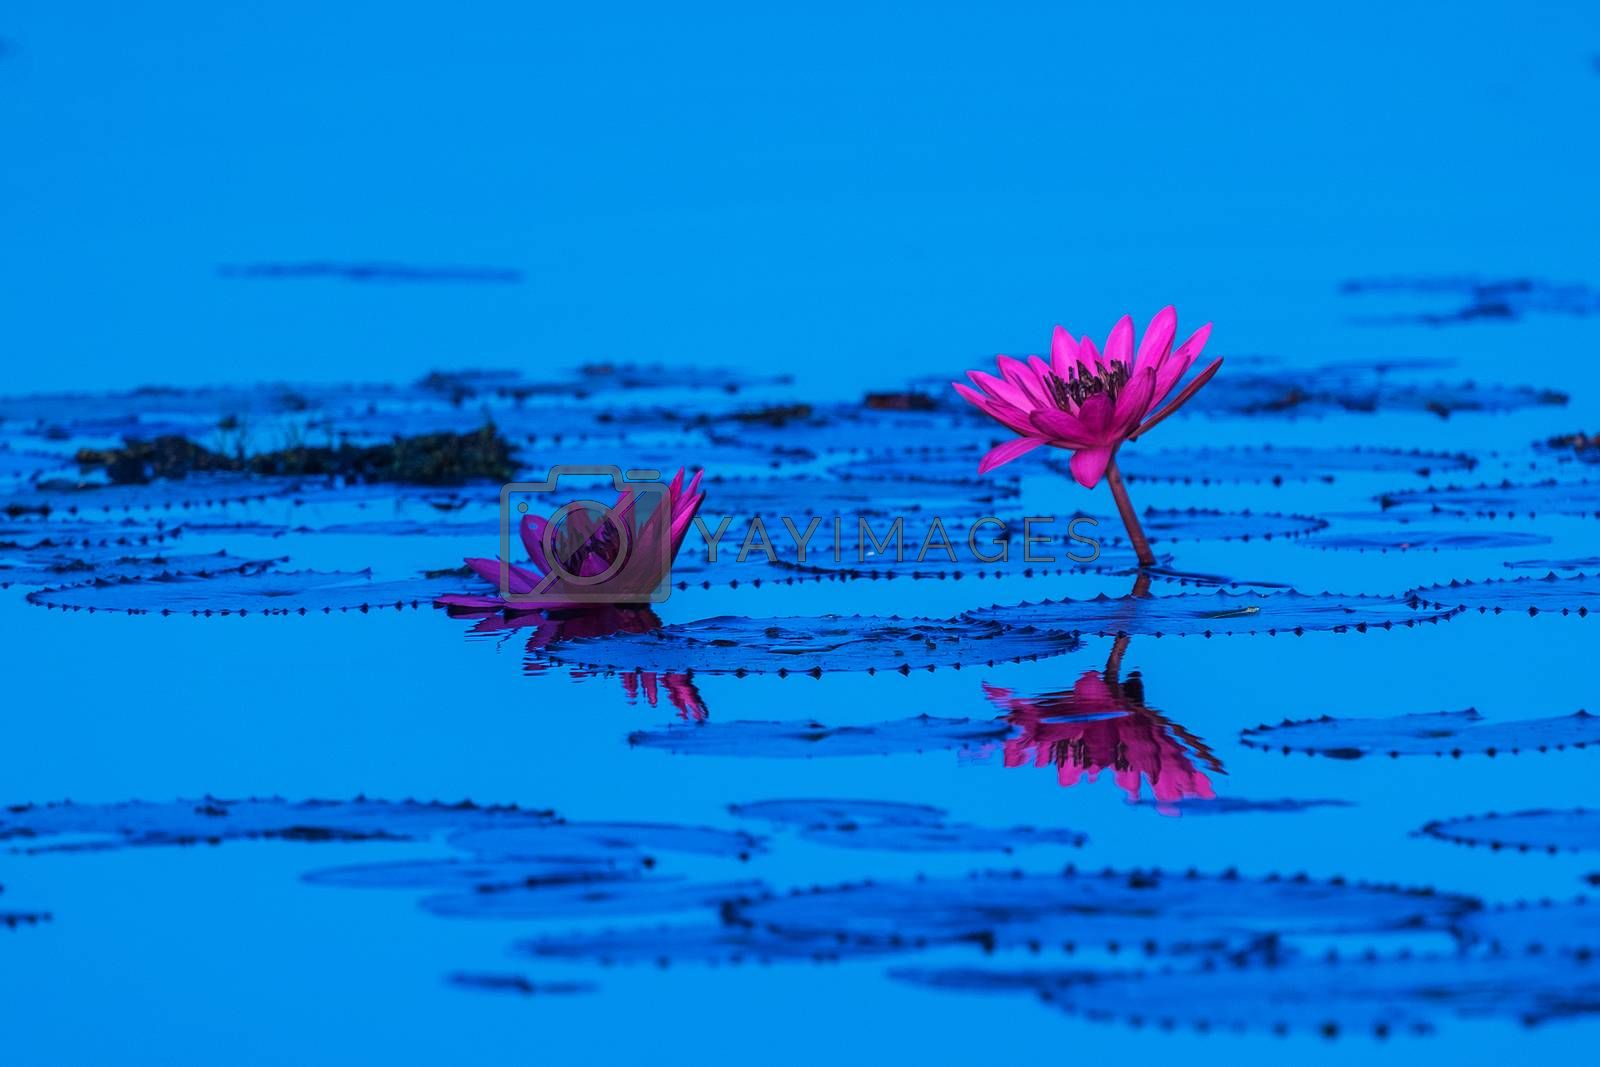 Pink and red lotus lake at Udonthani Thailand by Surasak